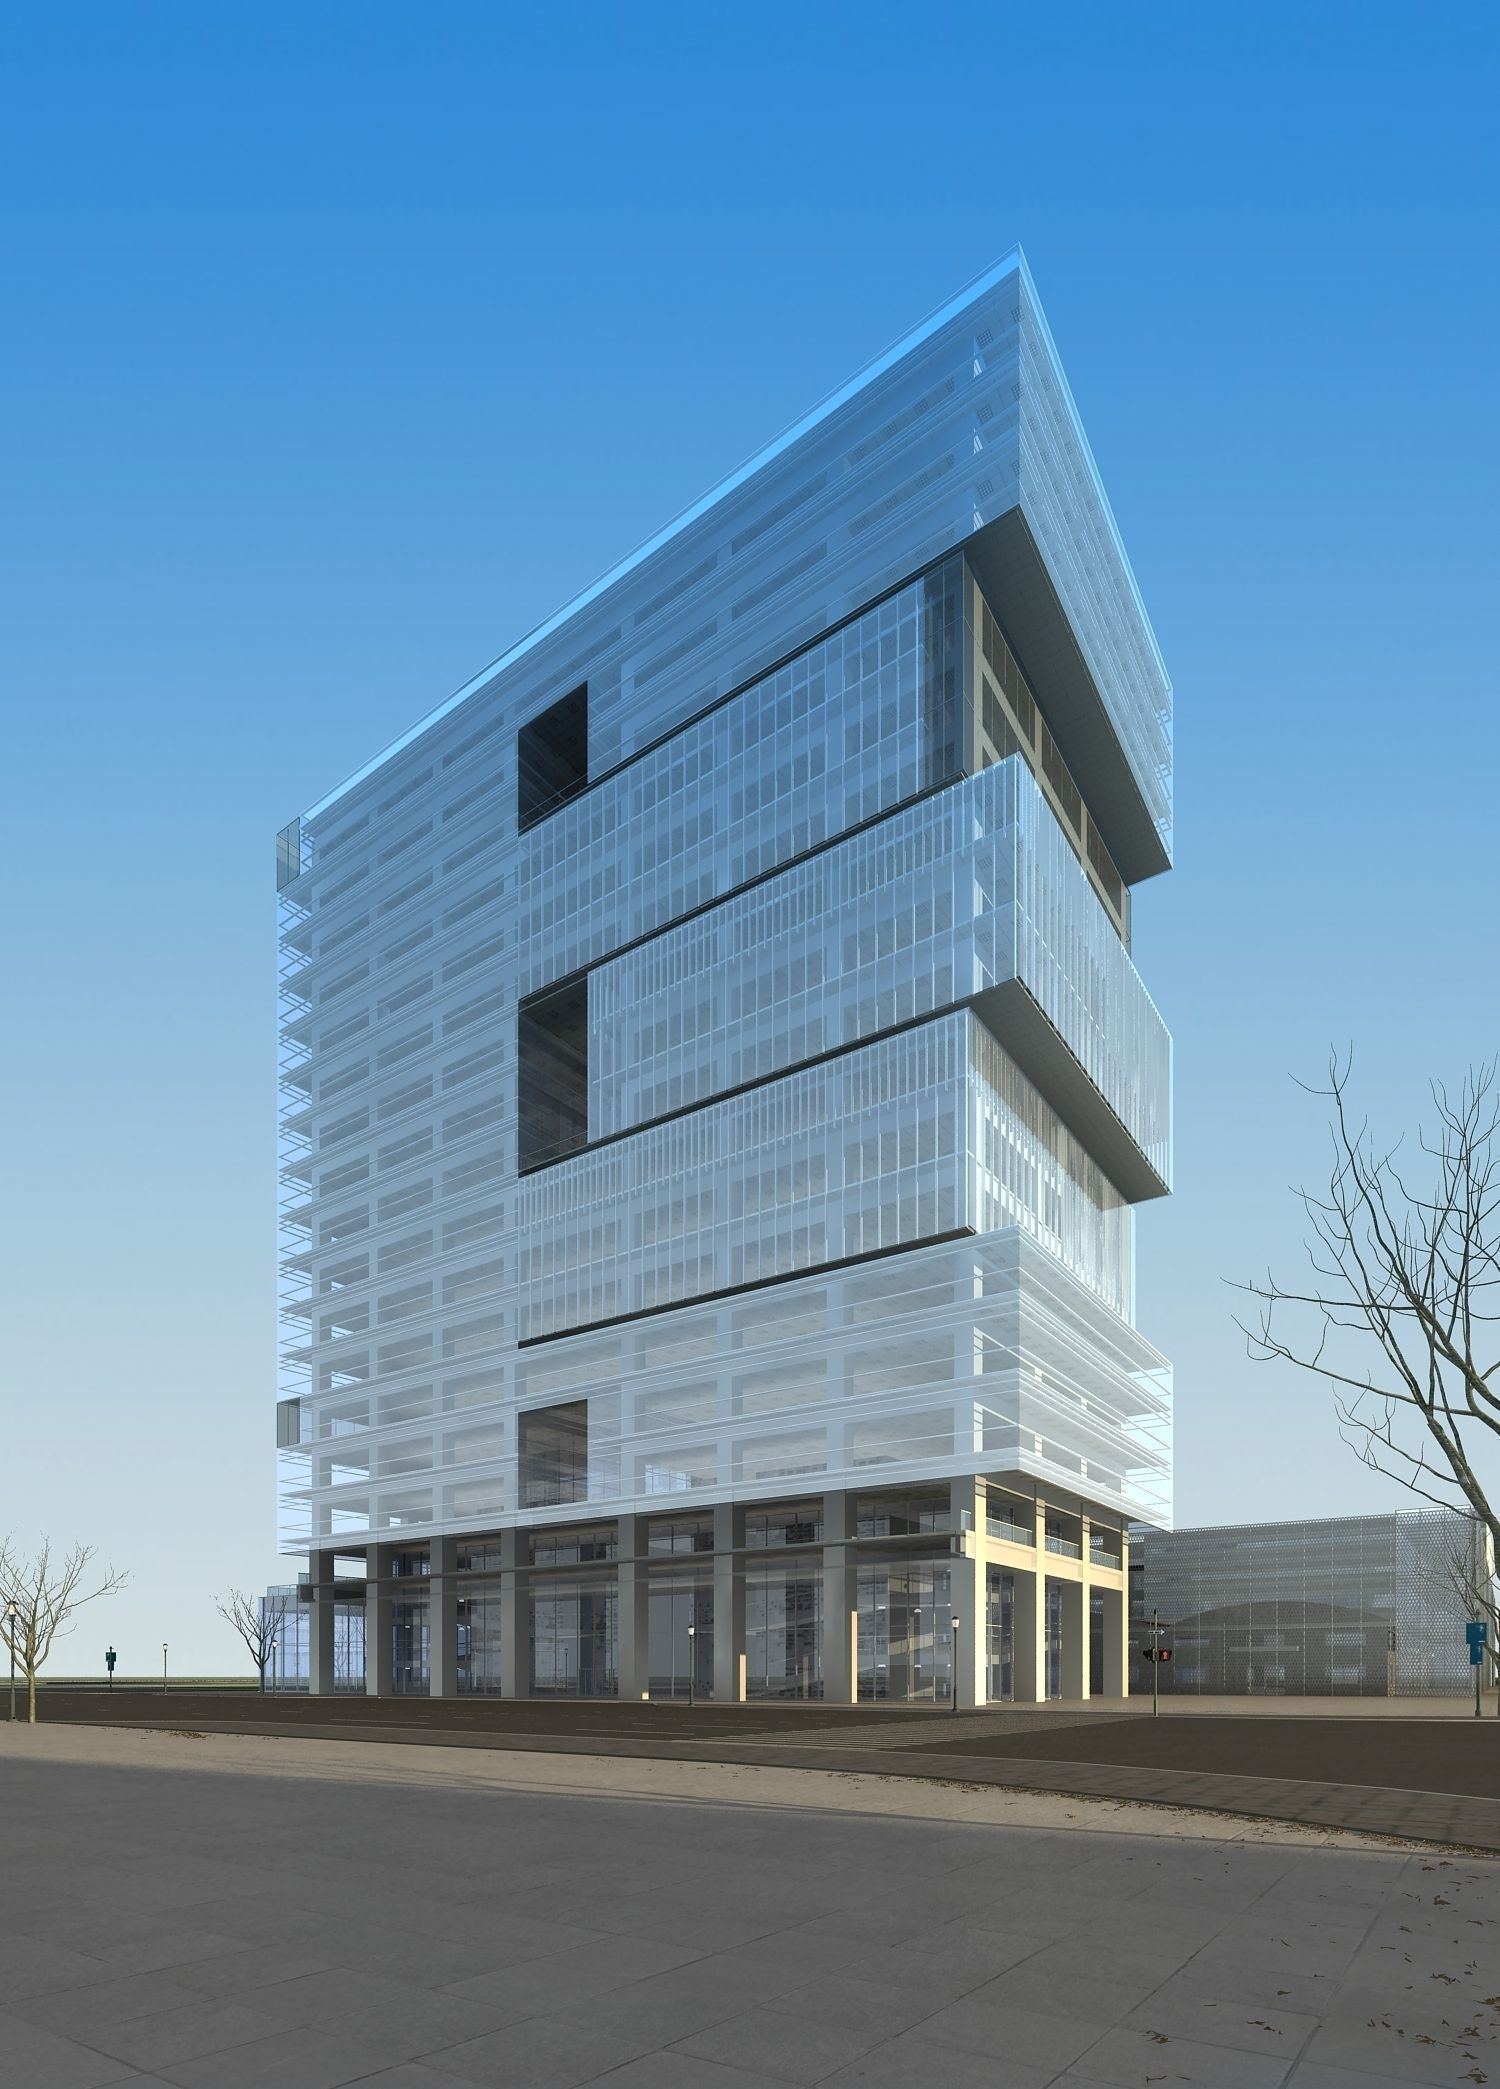 Modern commercial building design 3d model max for Modern office building design